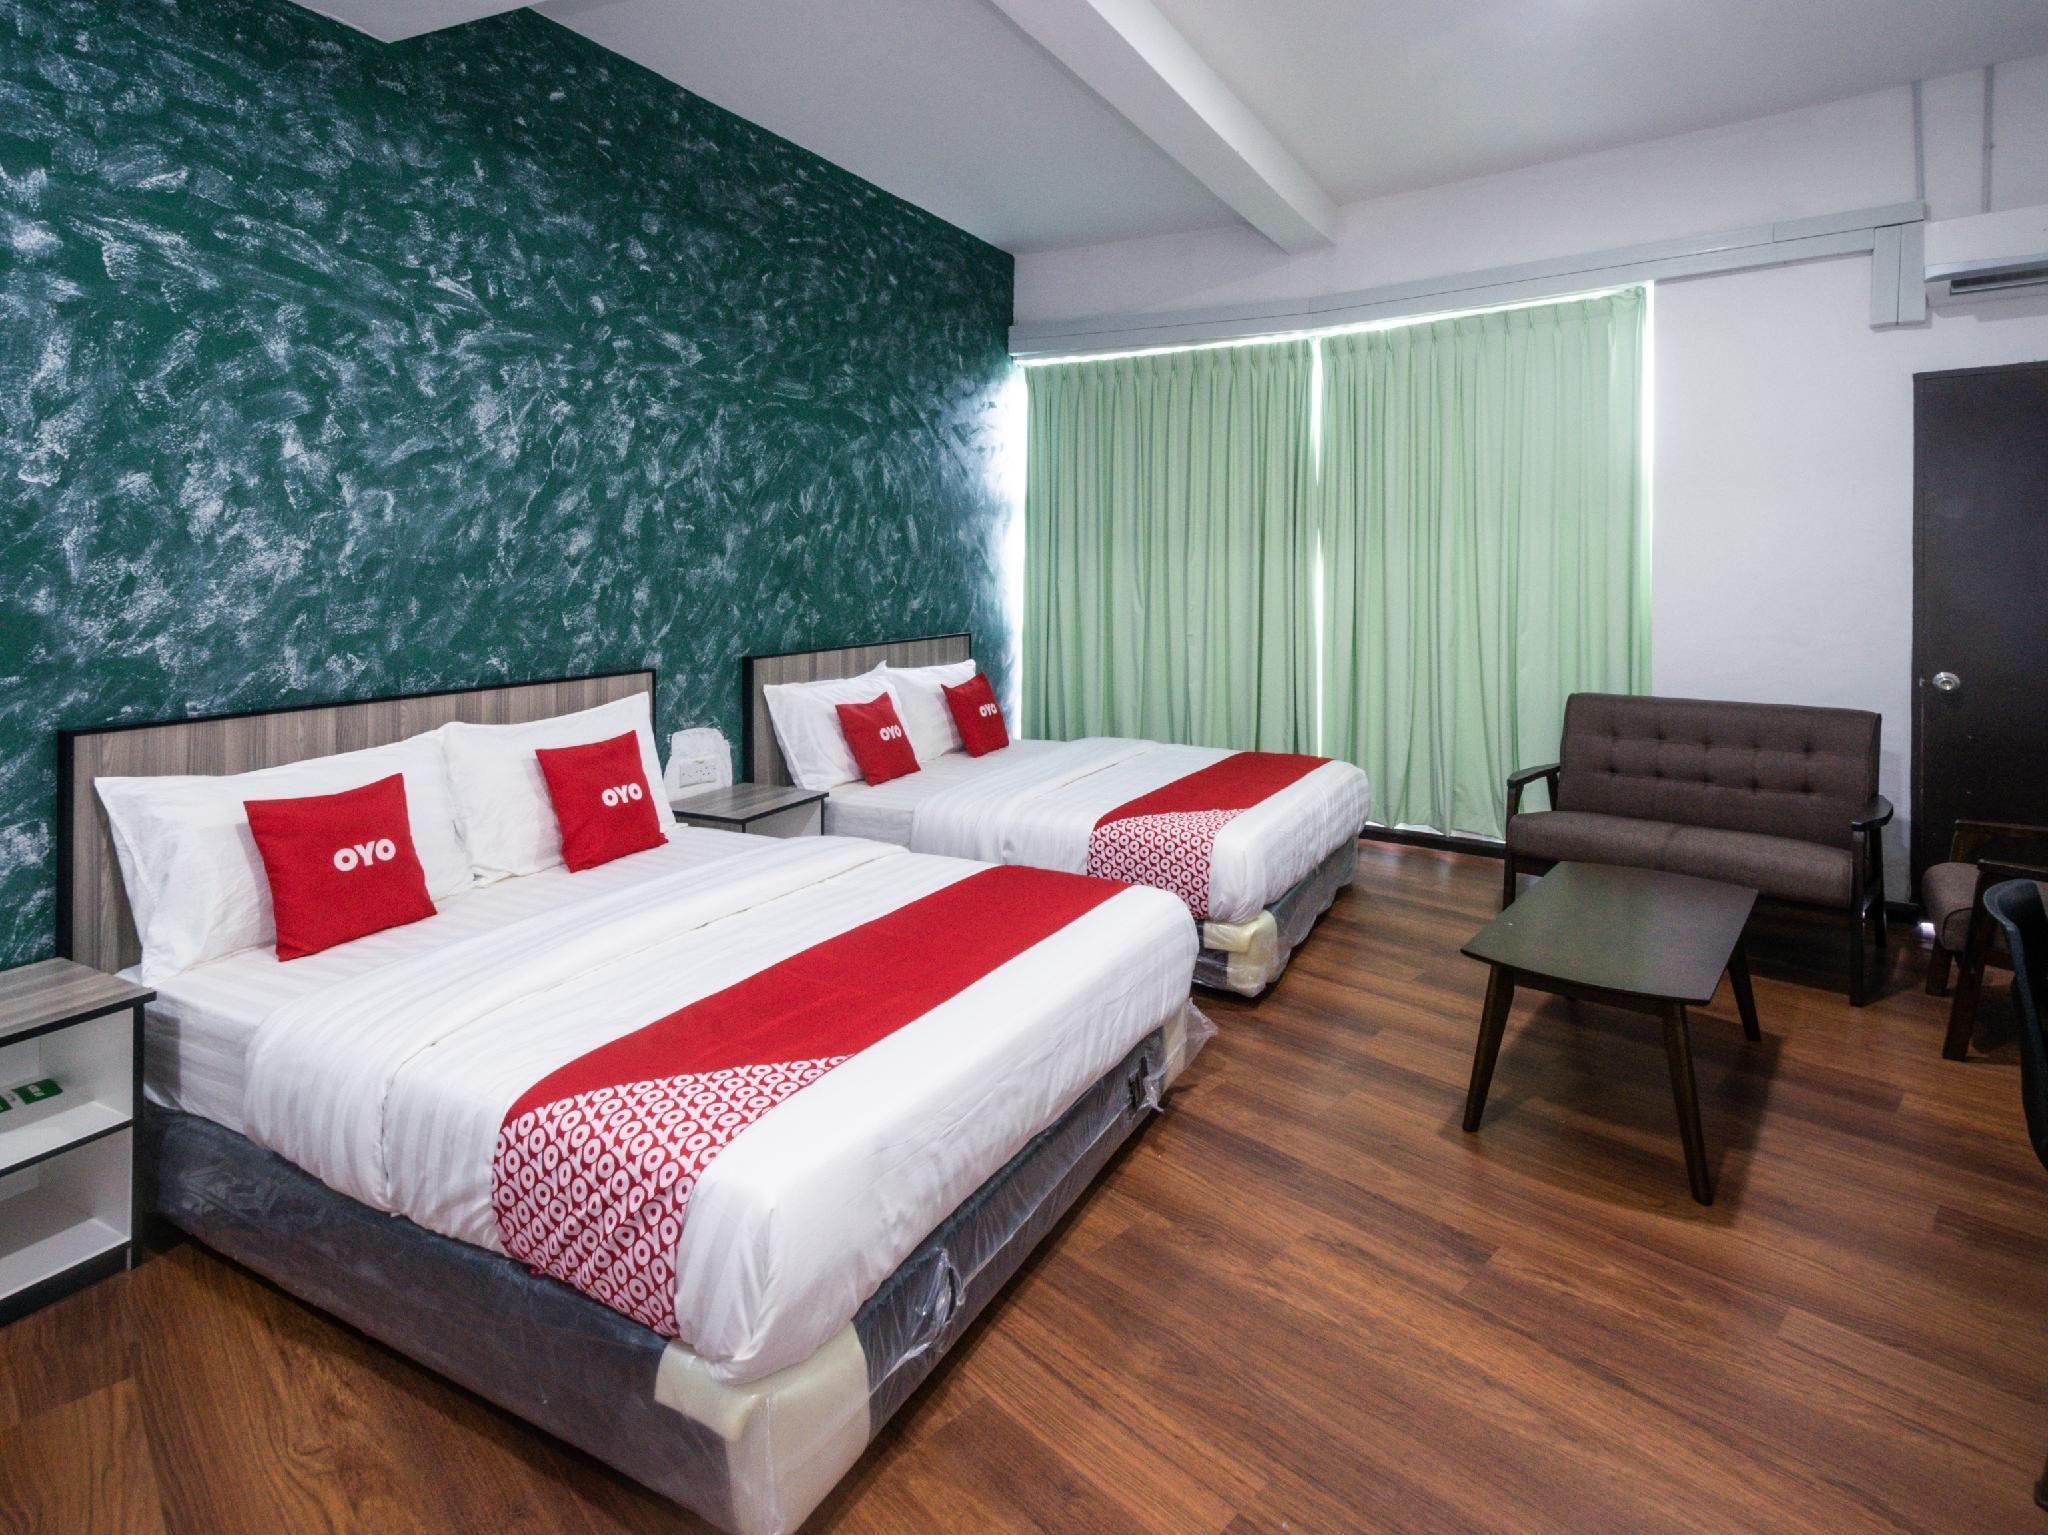 OYO 89840 69 Room 4 Stay